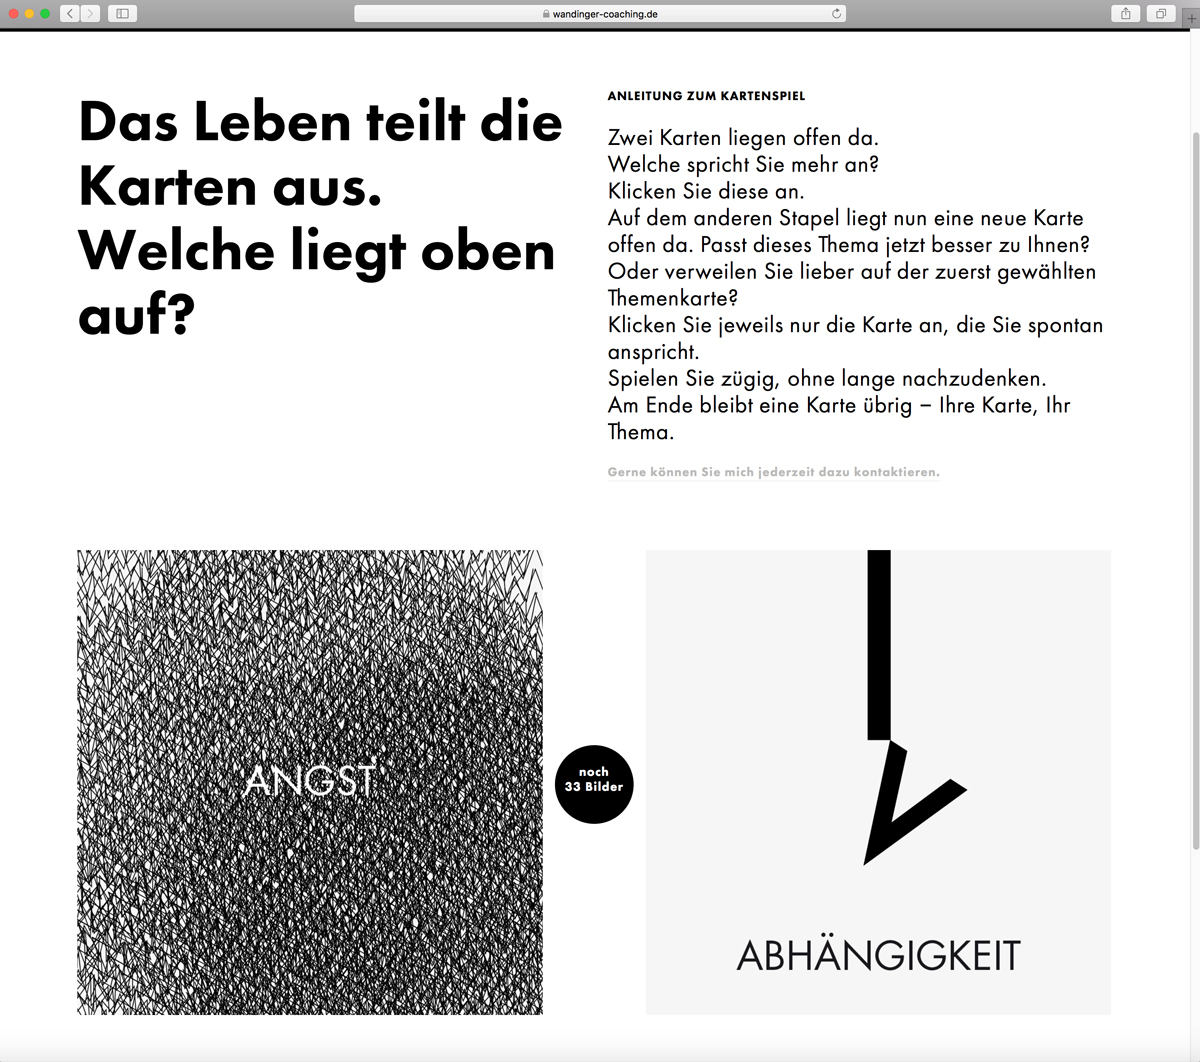 aw-website2.jpg